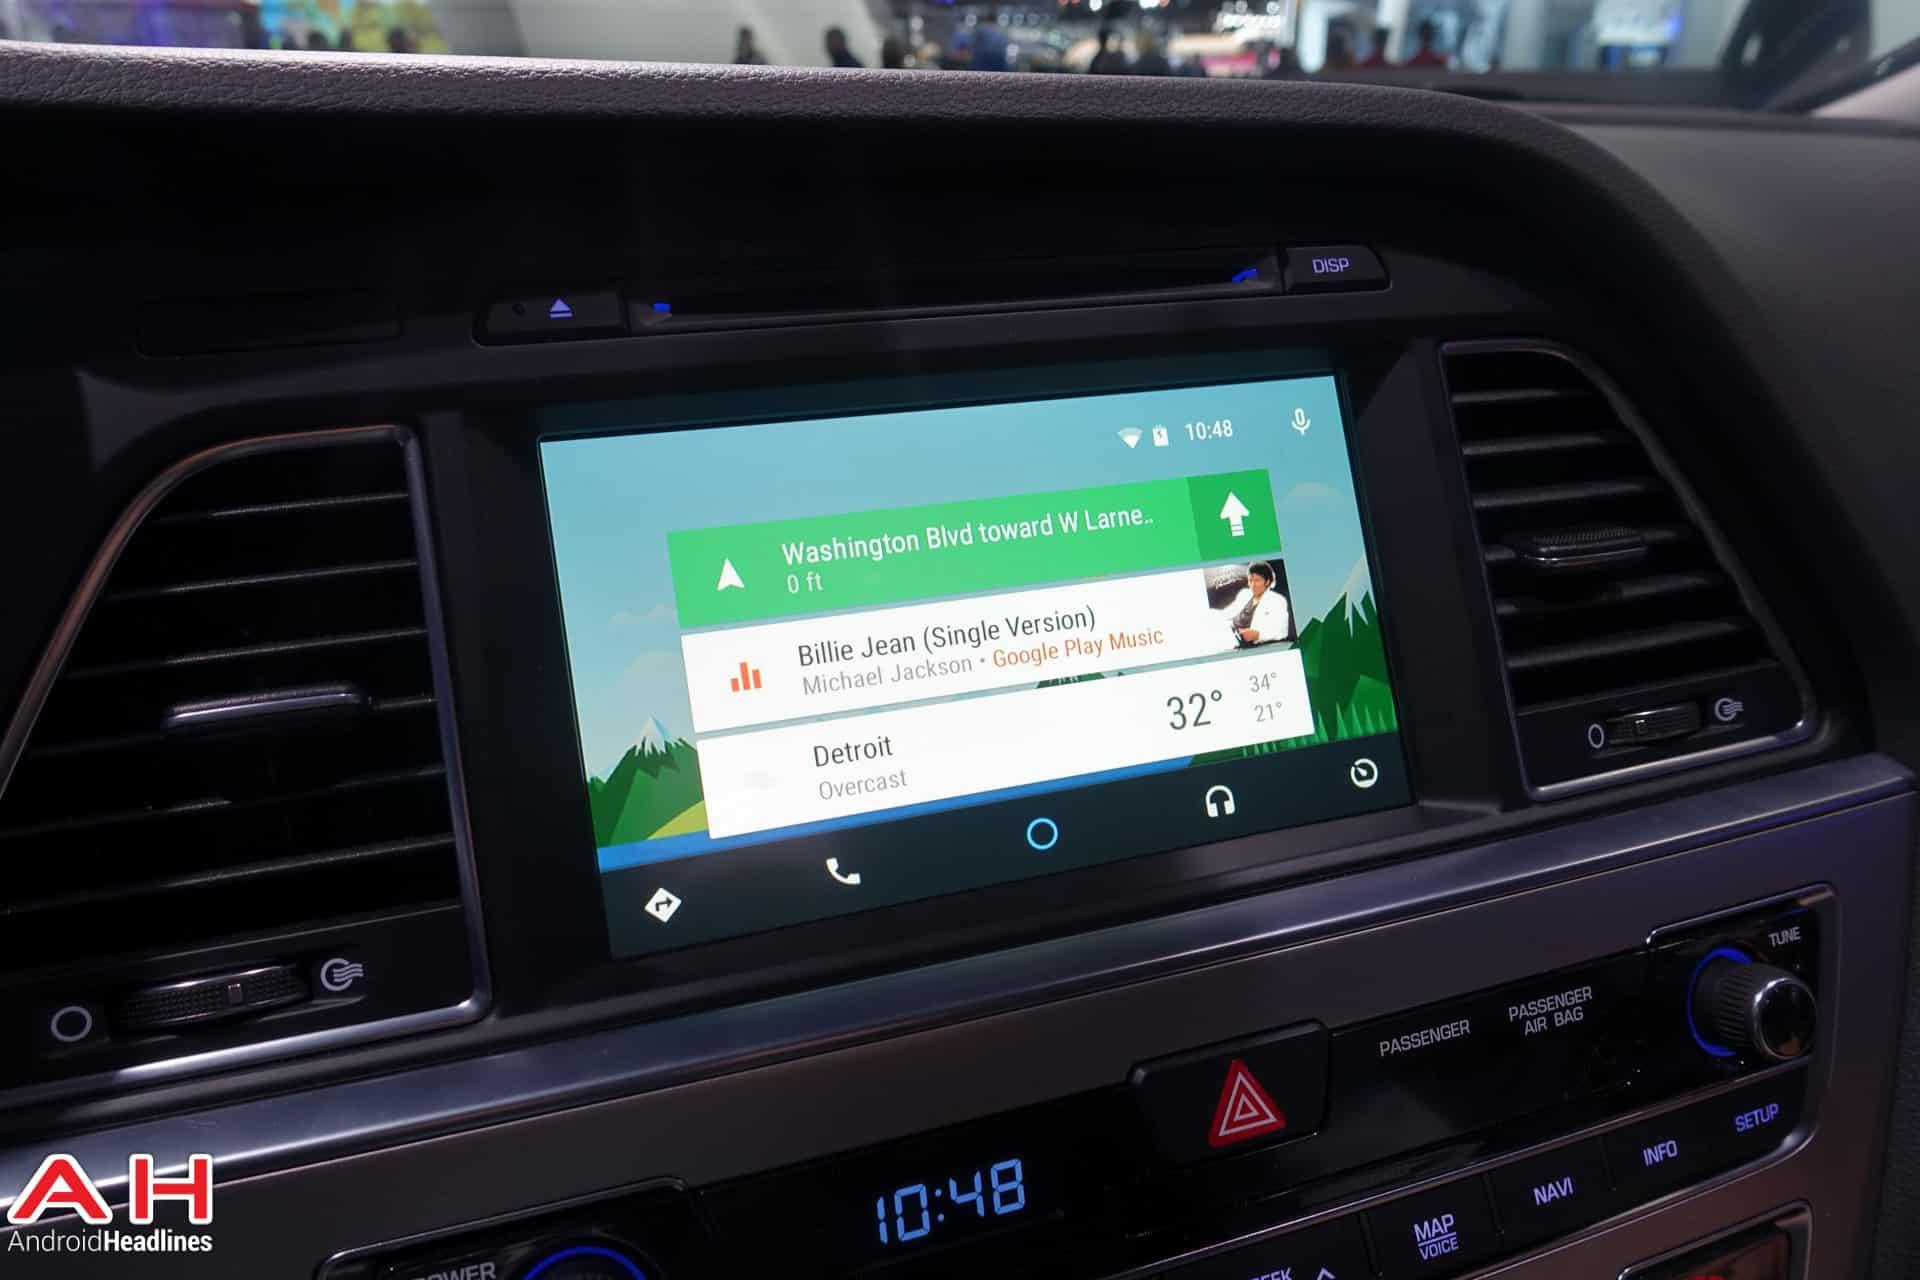 Hyundai Android Auto AH 02539